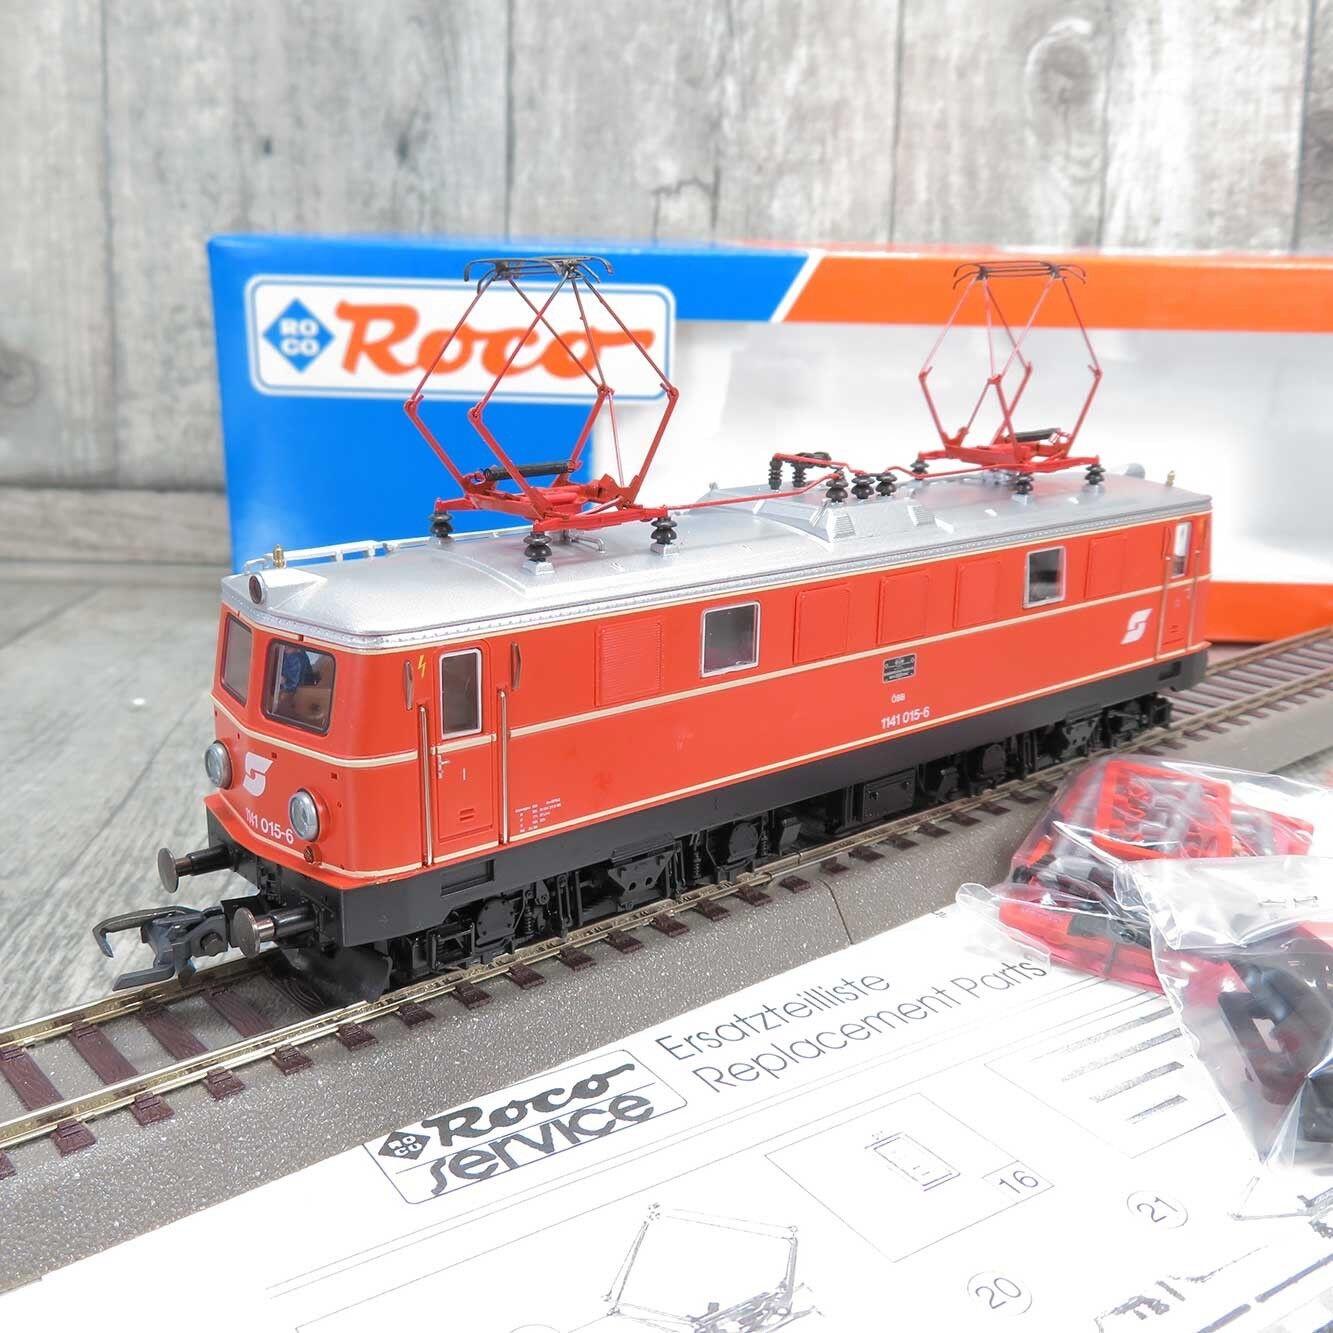 ROCO 63576 - HO - ÖBB - E-Lok 1141 015-6 - mit DSS -  B20952